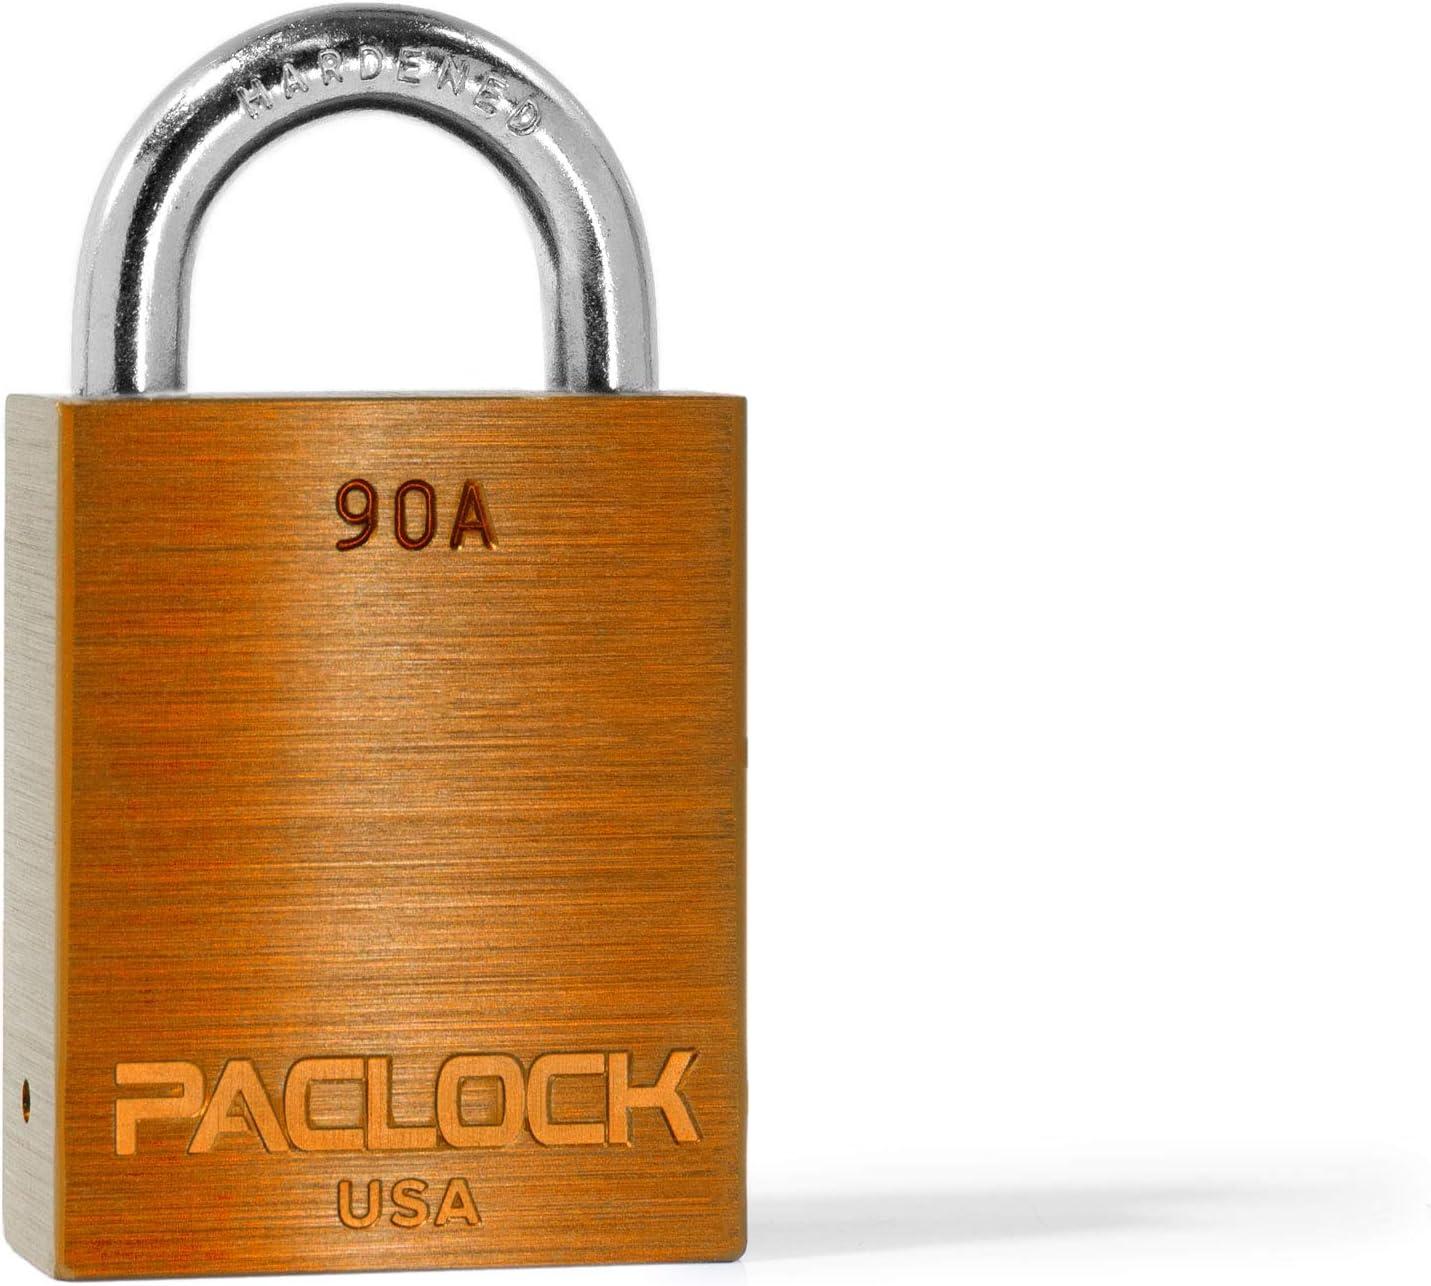 Max 65% OFF PACLOCK's 90A Series Padlock Buy American Free Shipping Cheap Bargain Gift T Act 4